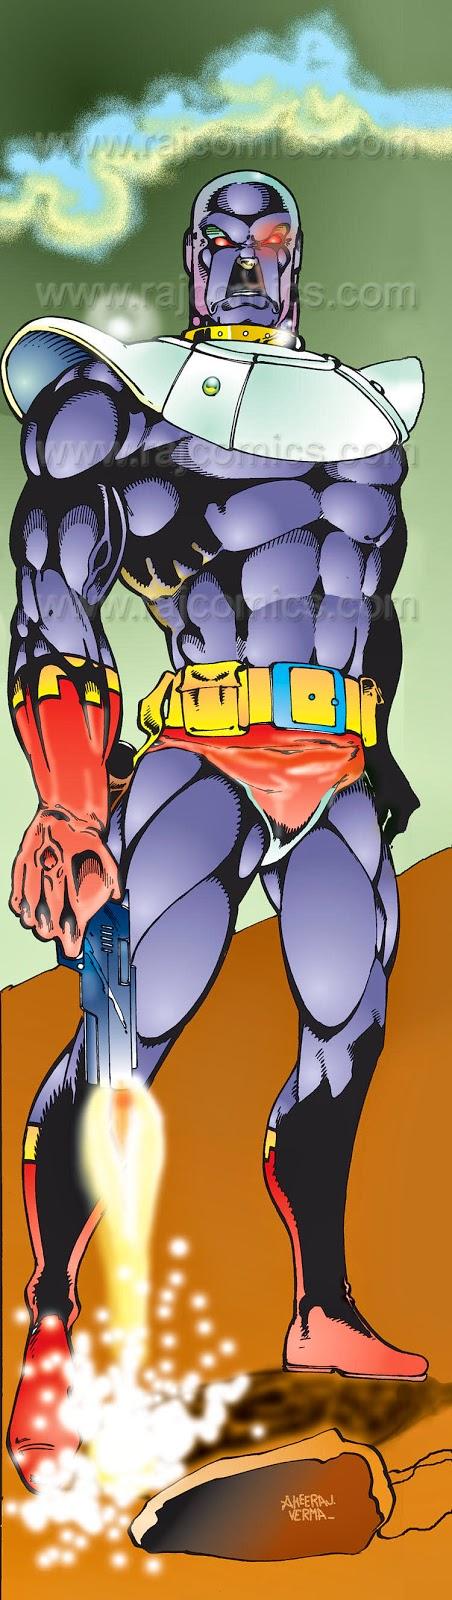 Doga Solo Raj Comics